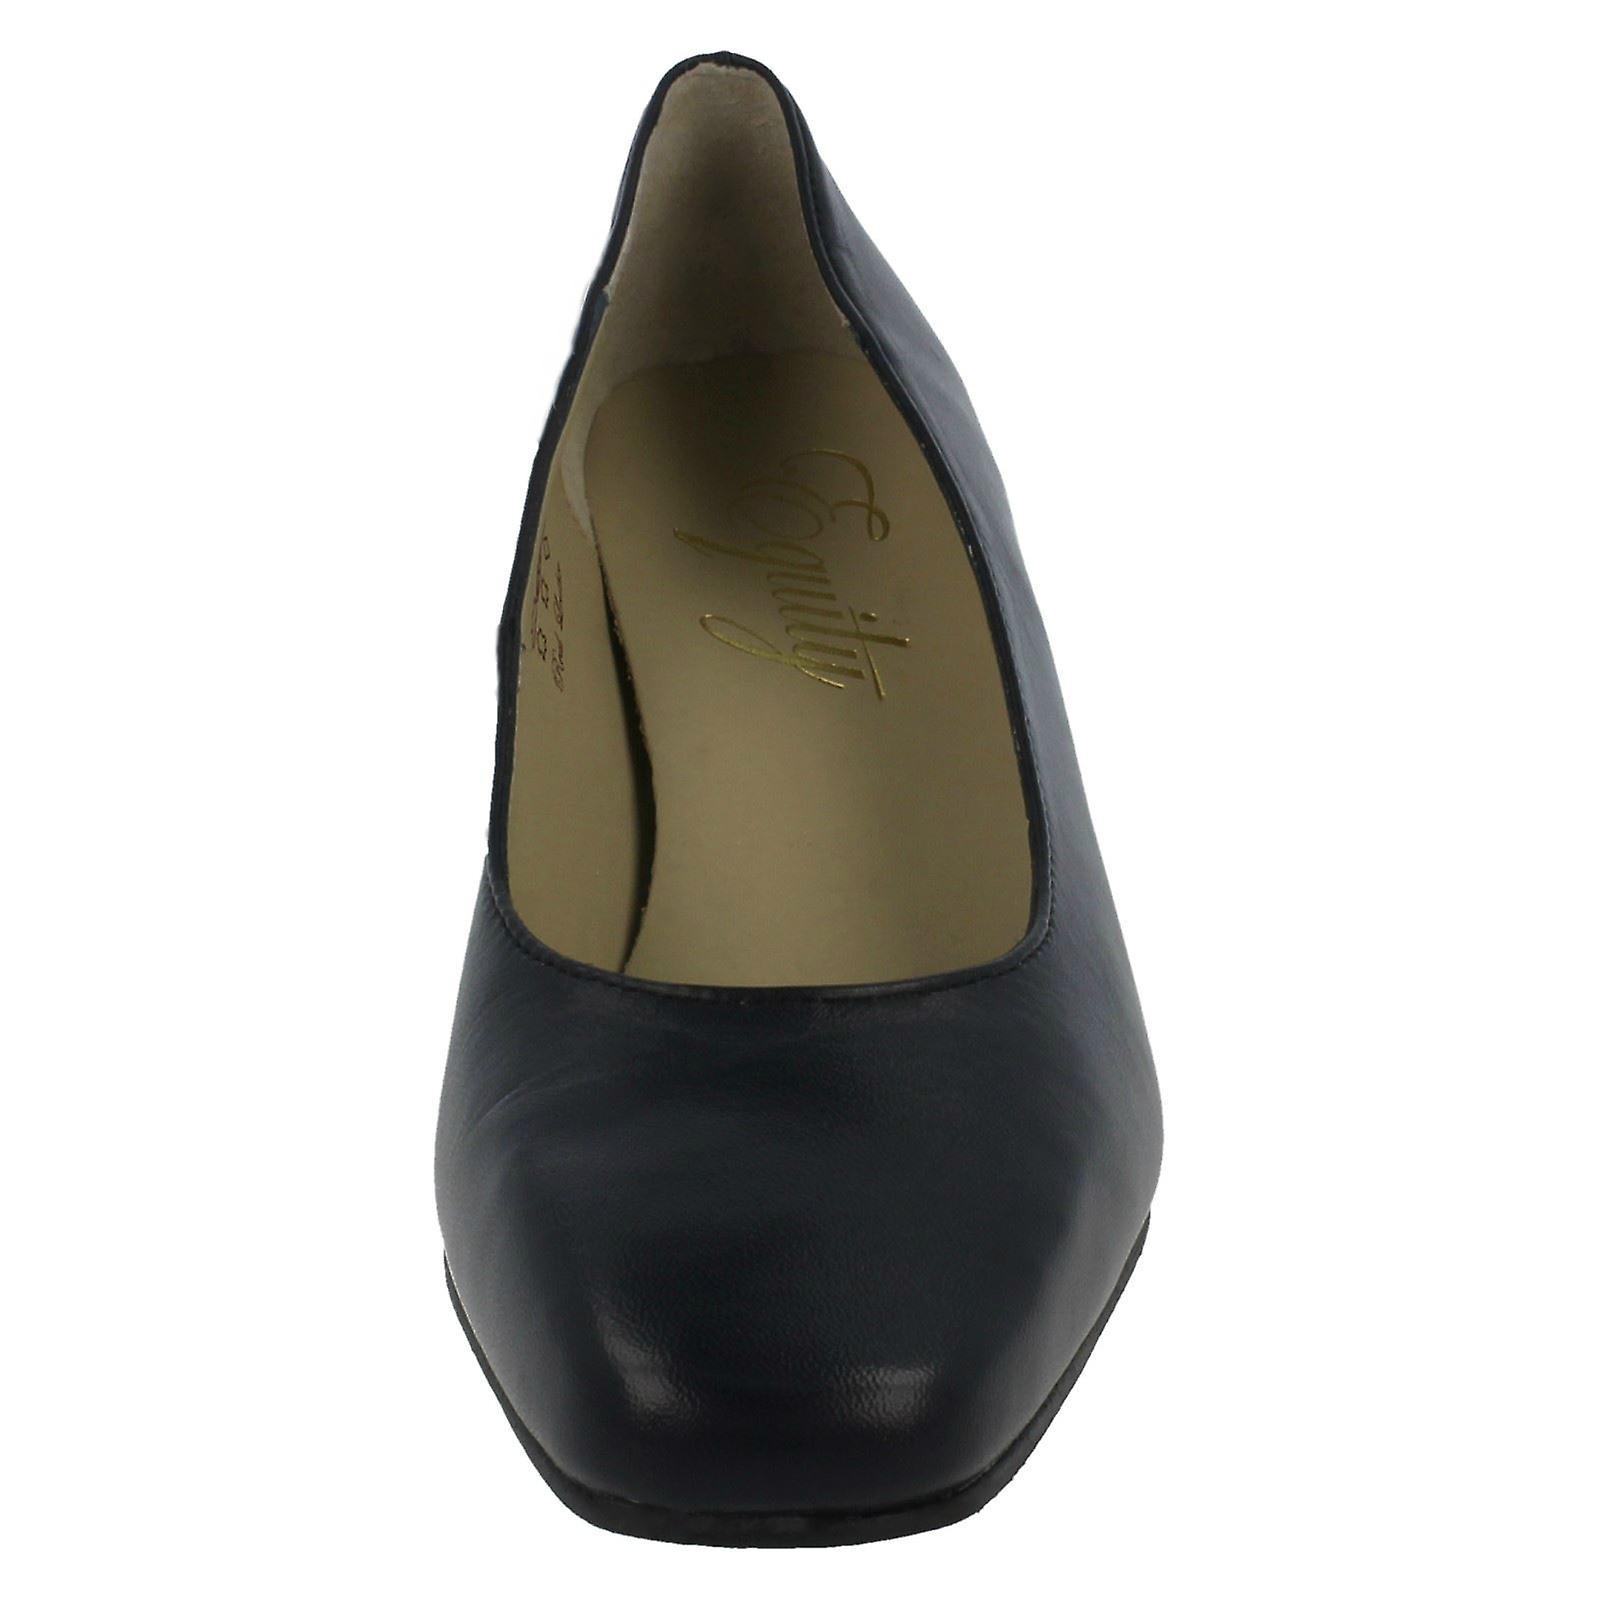 Ladies Equity Wide Fitting Court scarpe Valerie   Vendita        Uomo/Donna Scarpa  7d44ee